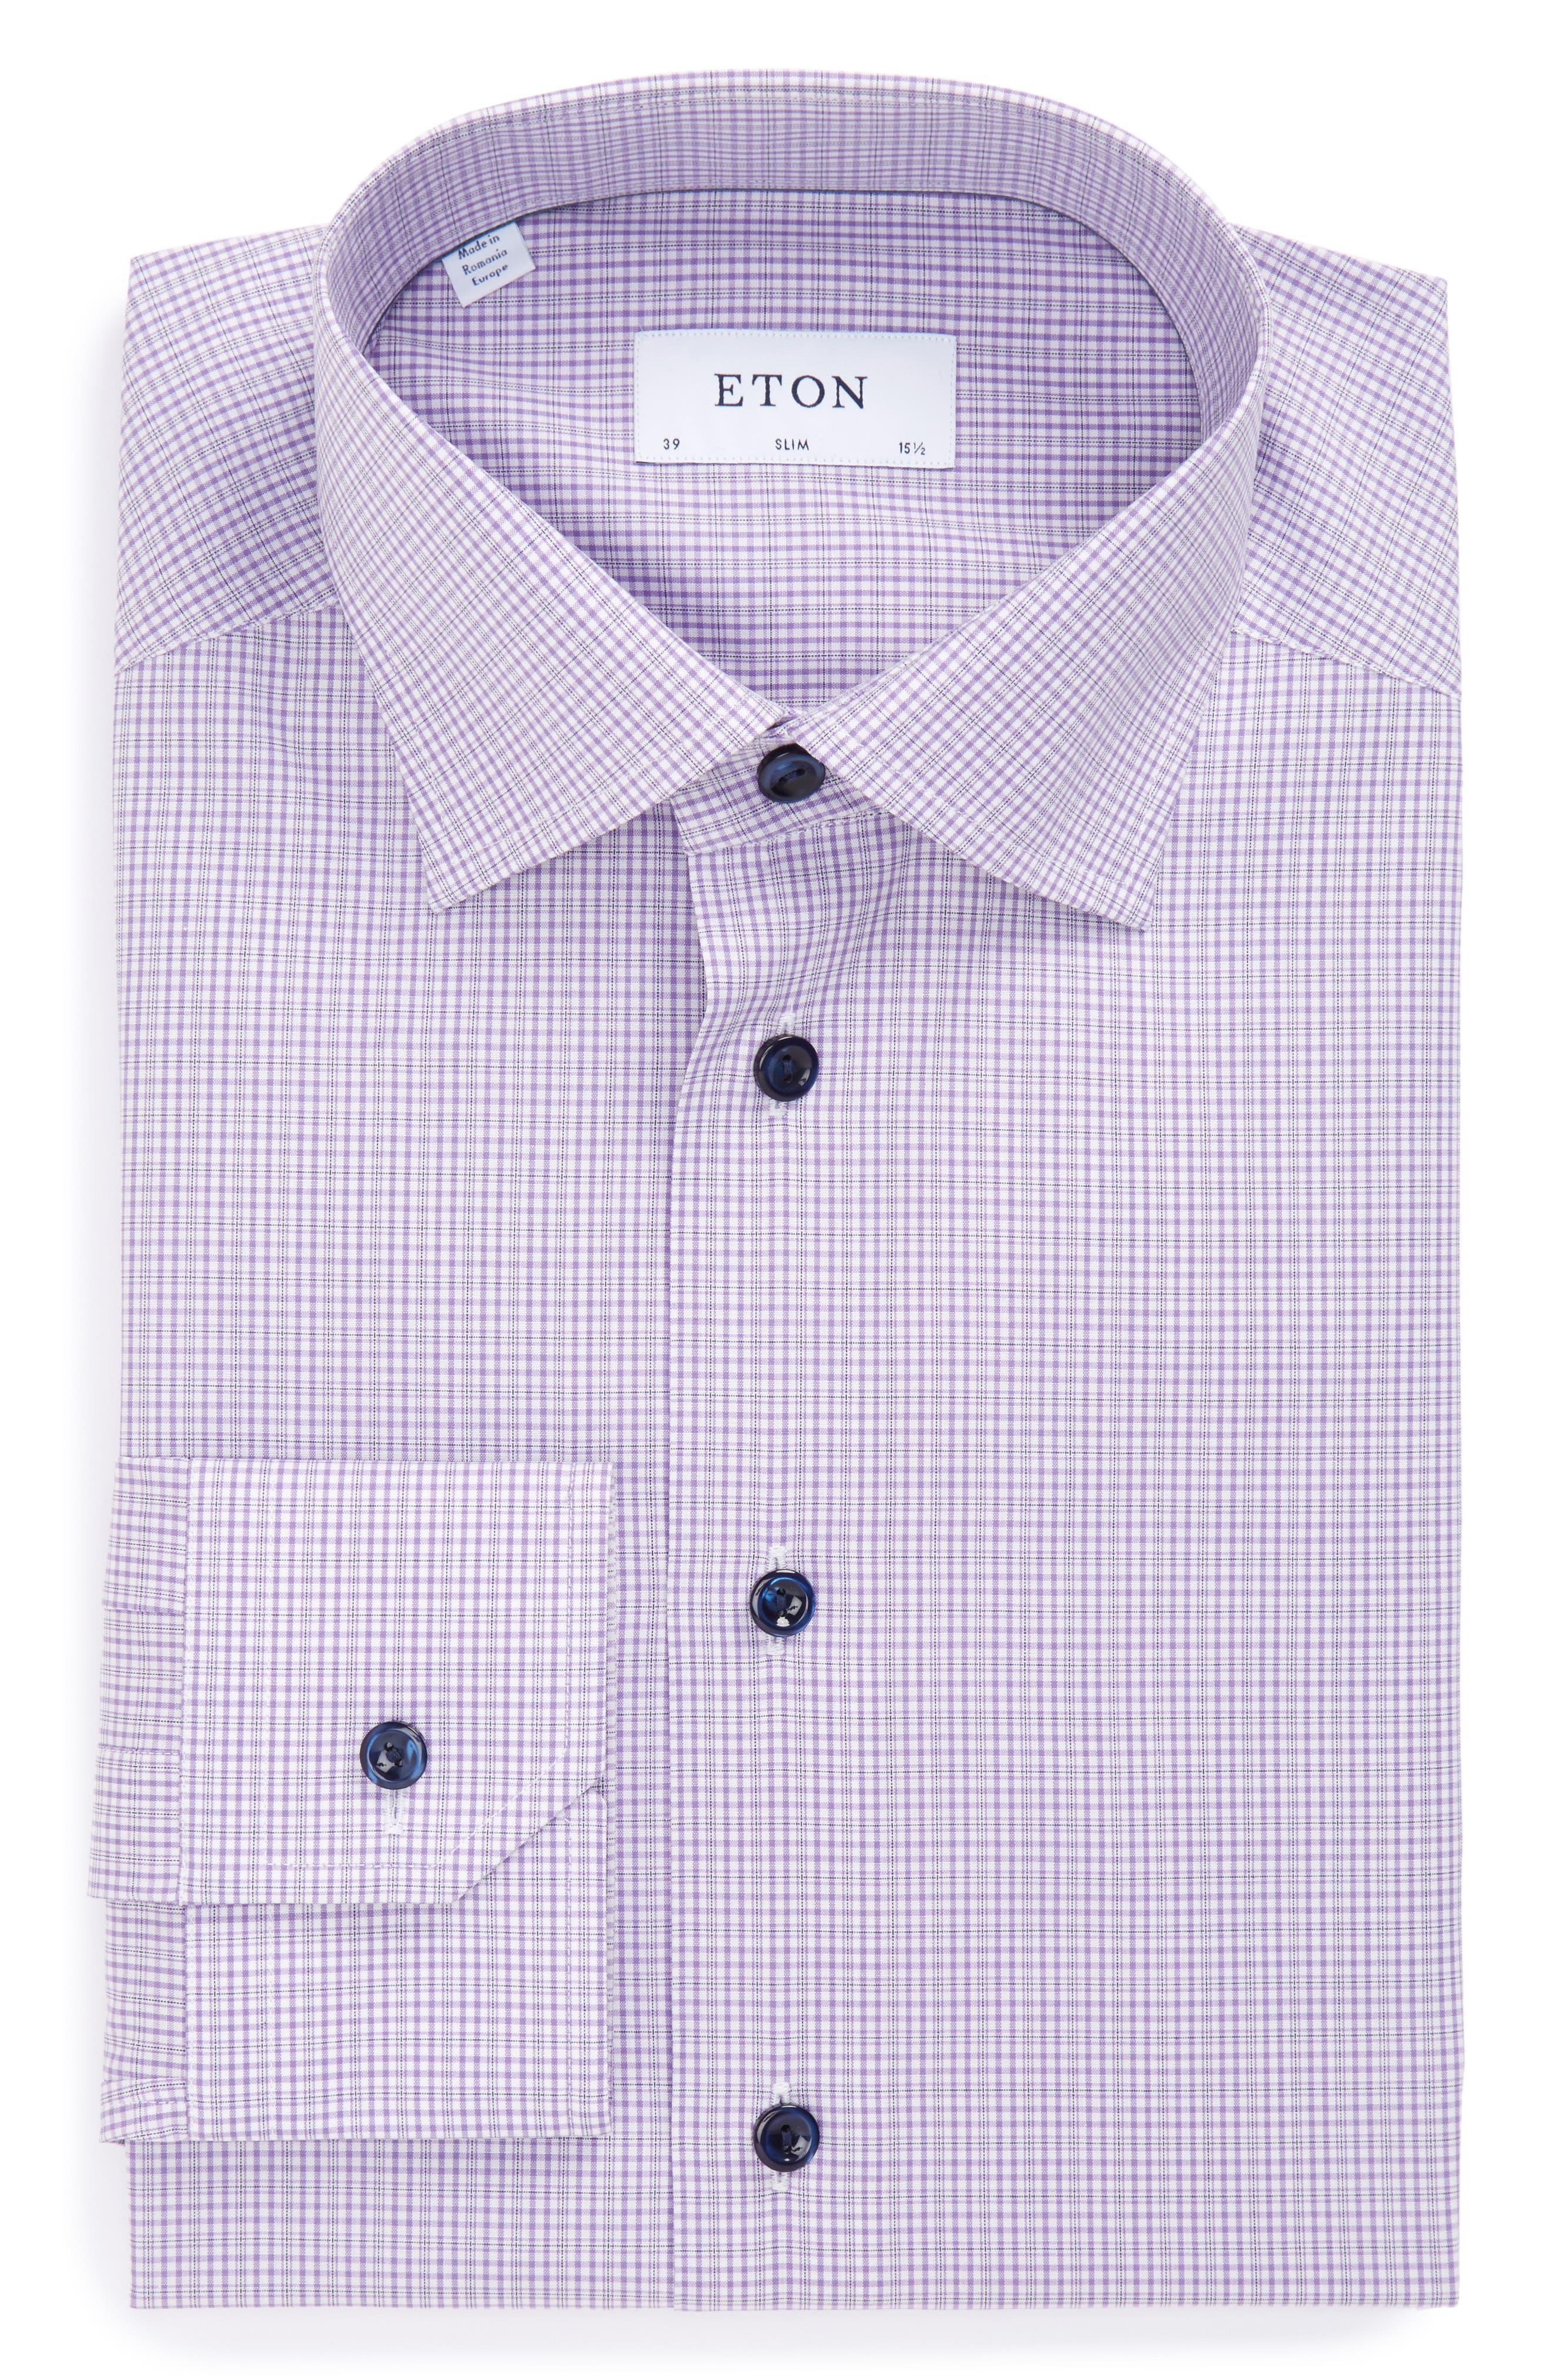 Alternate Image 1 Selected - Eton Slim Fit Plaid Dress Shirt